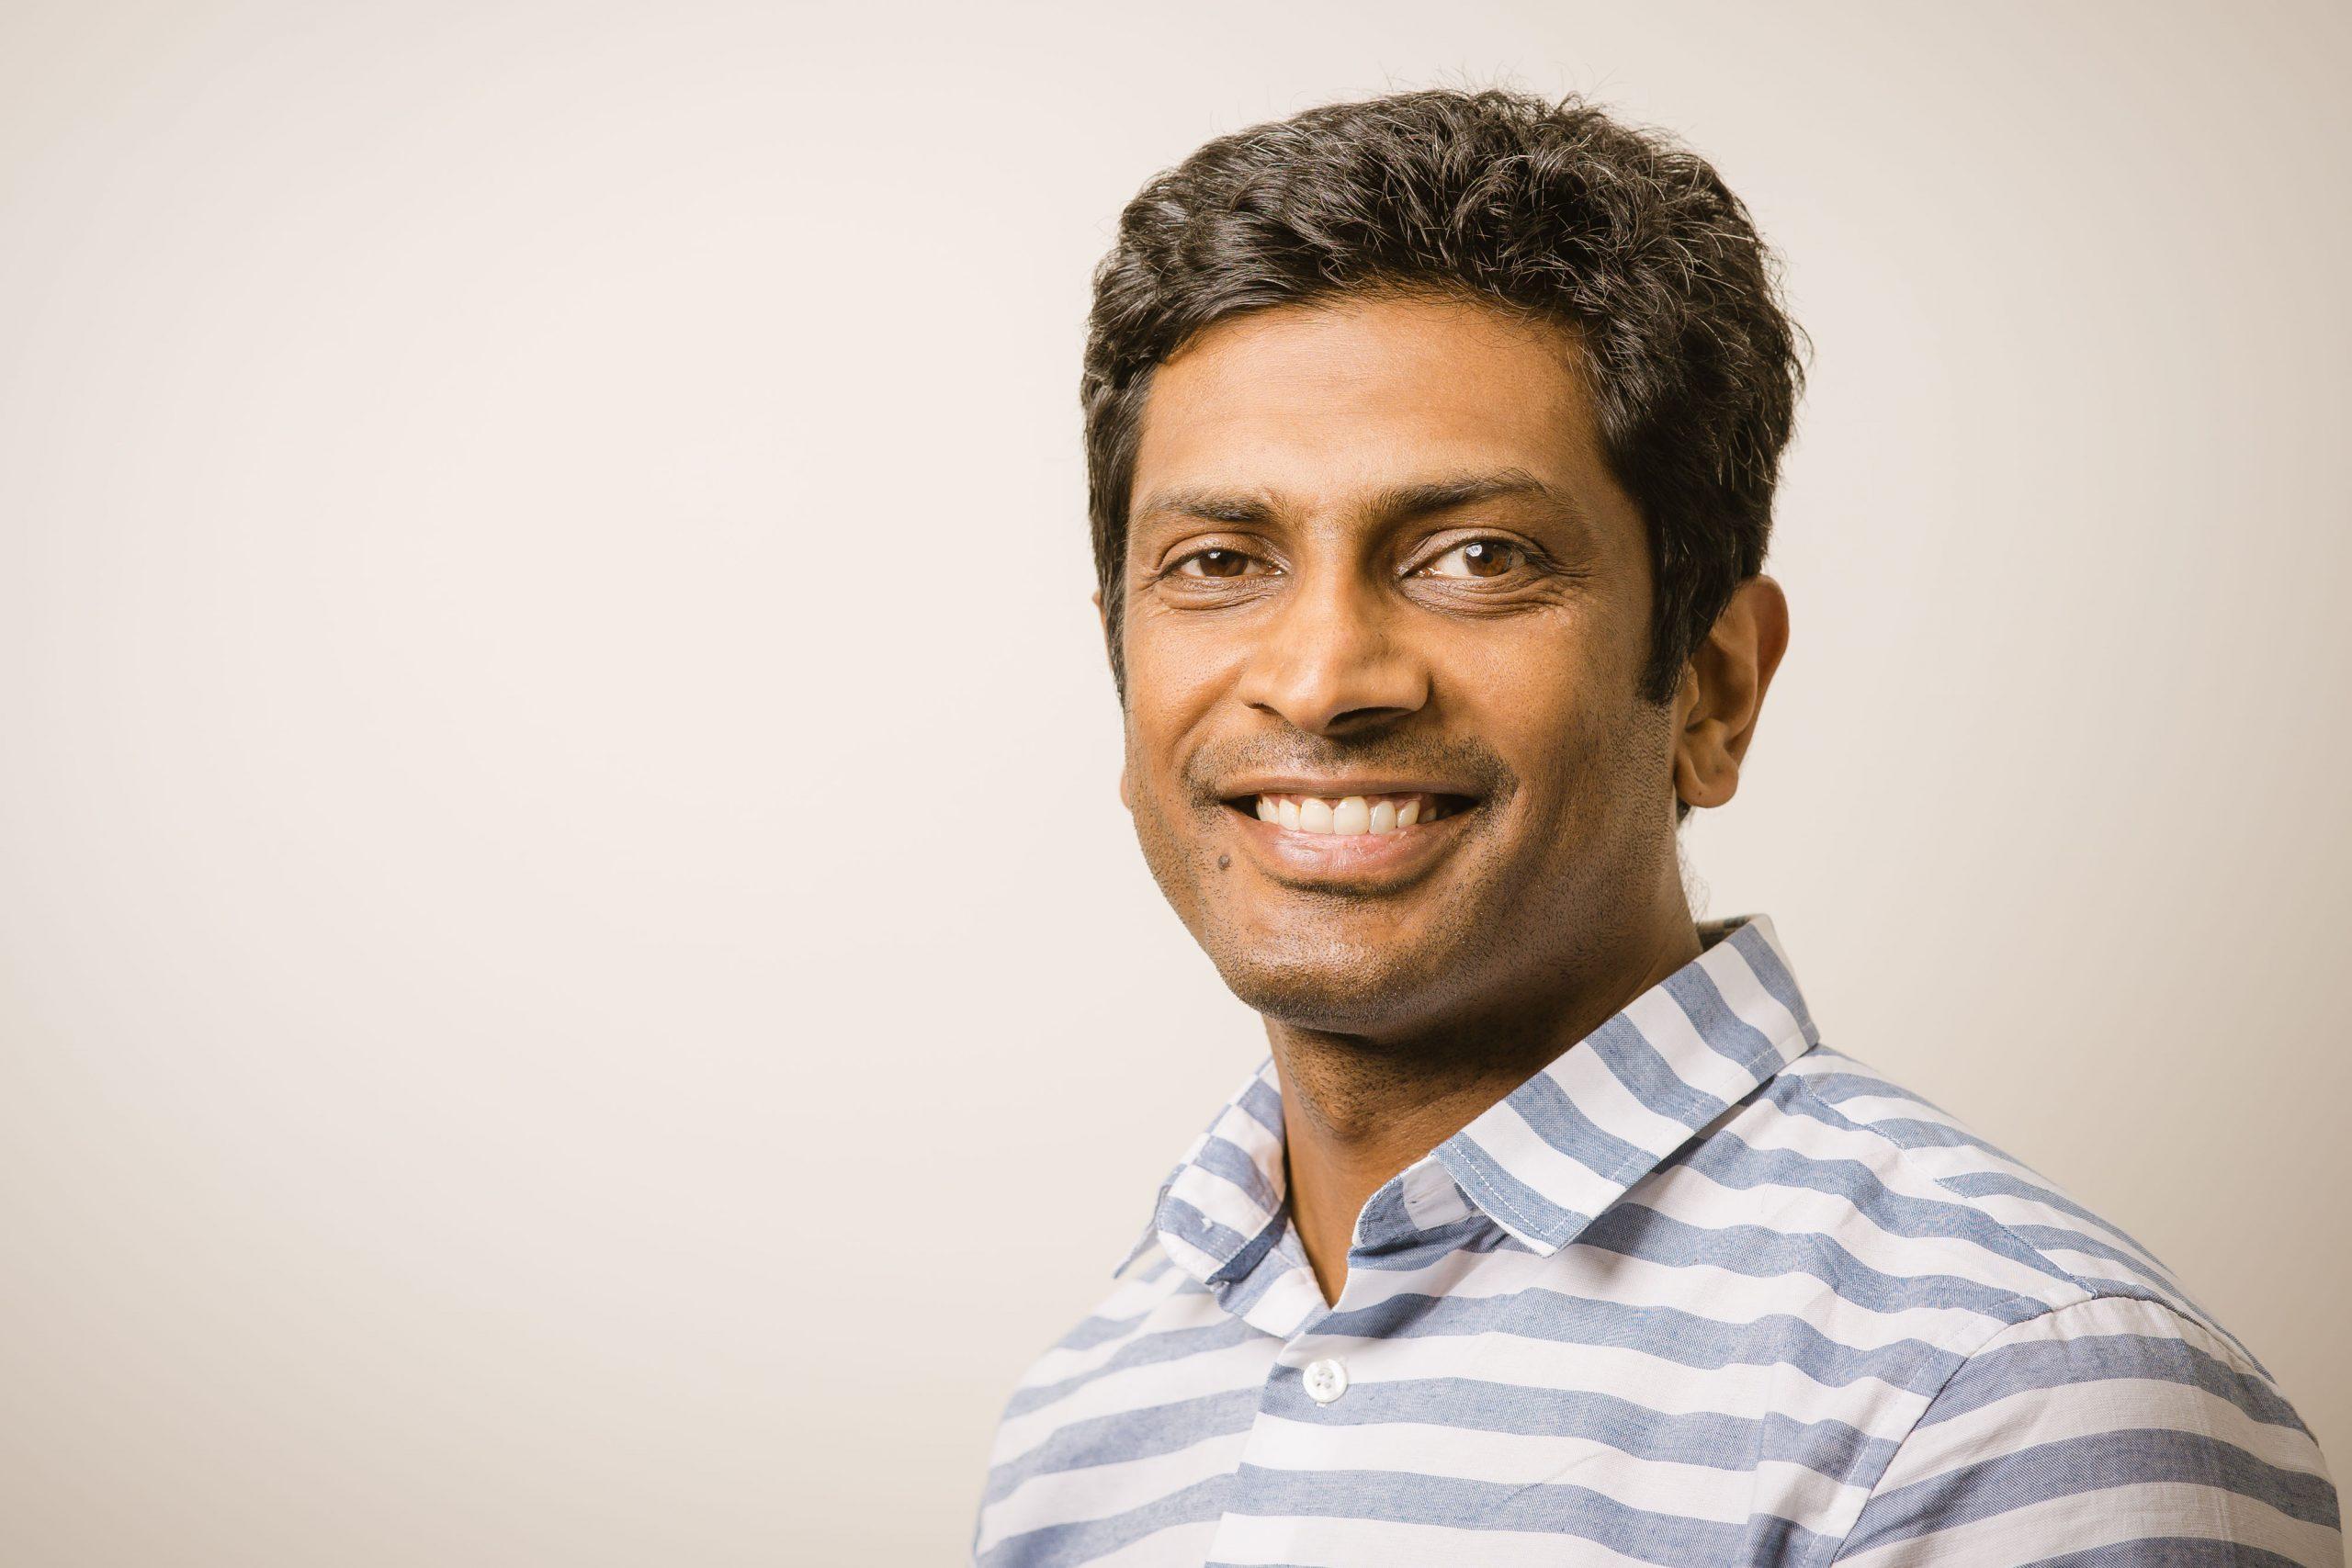 Vasanth Govindappa